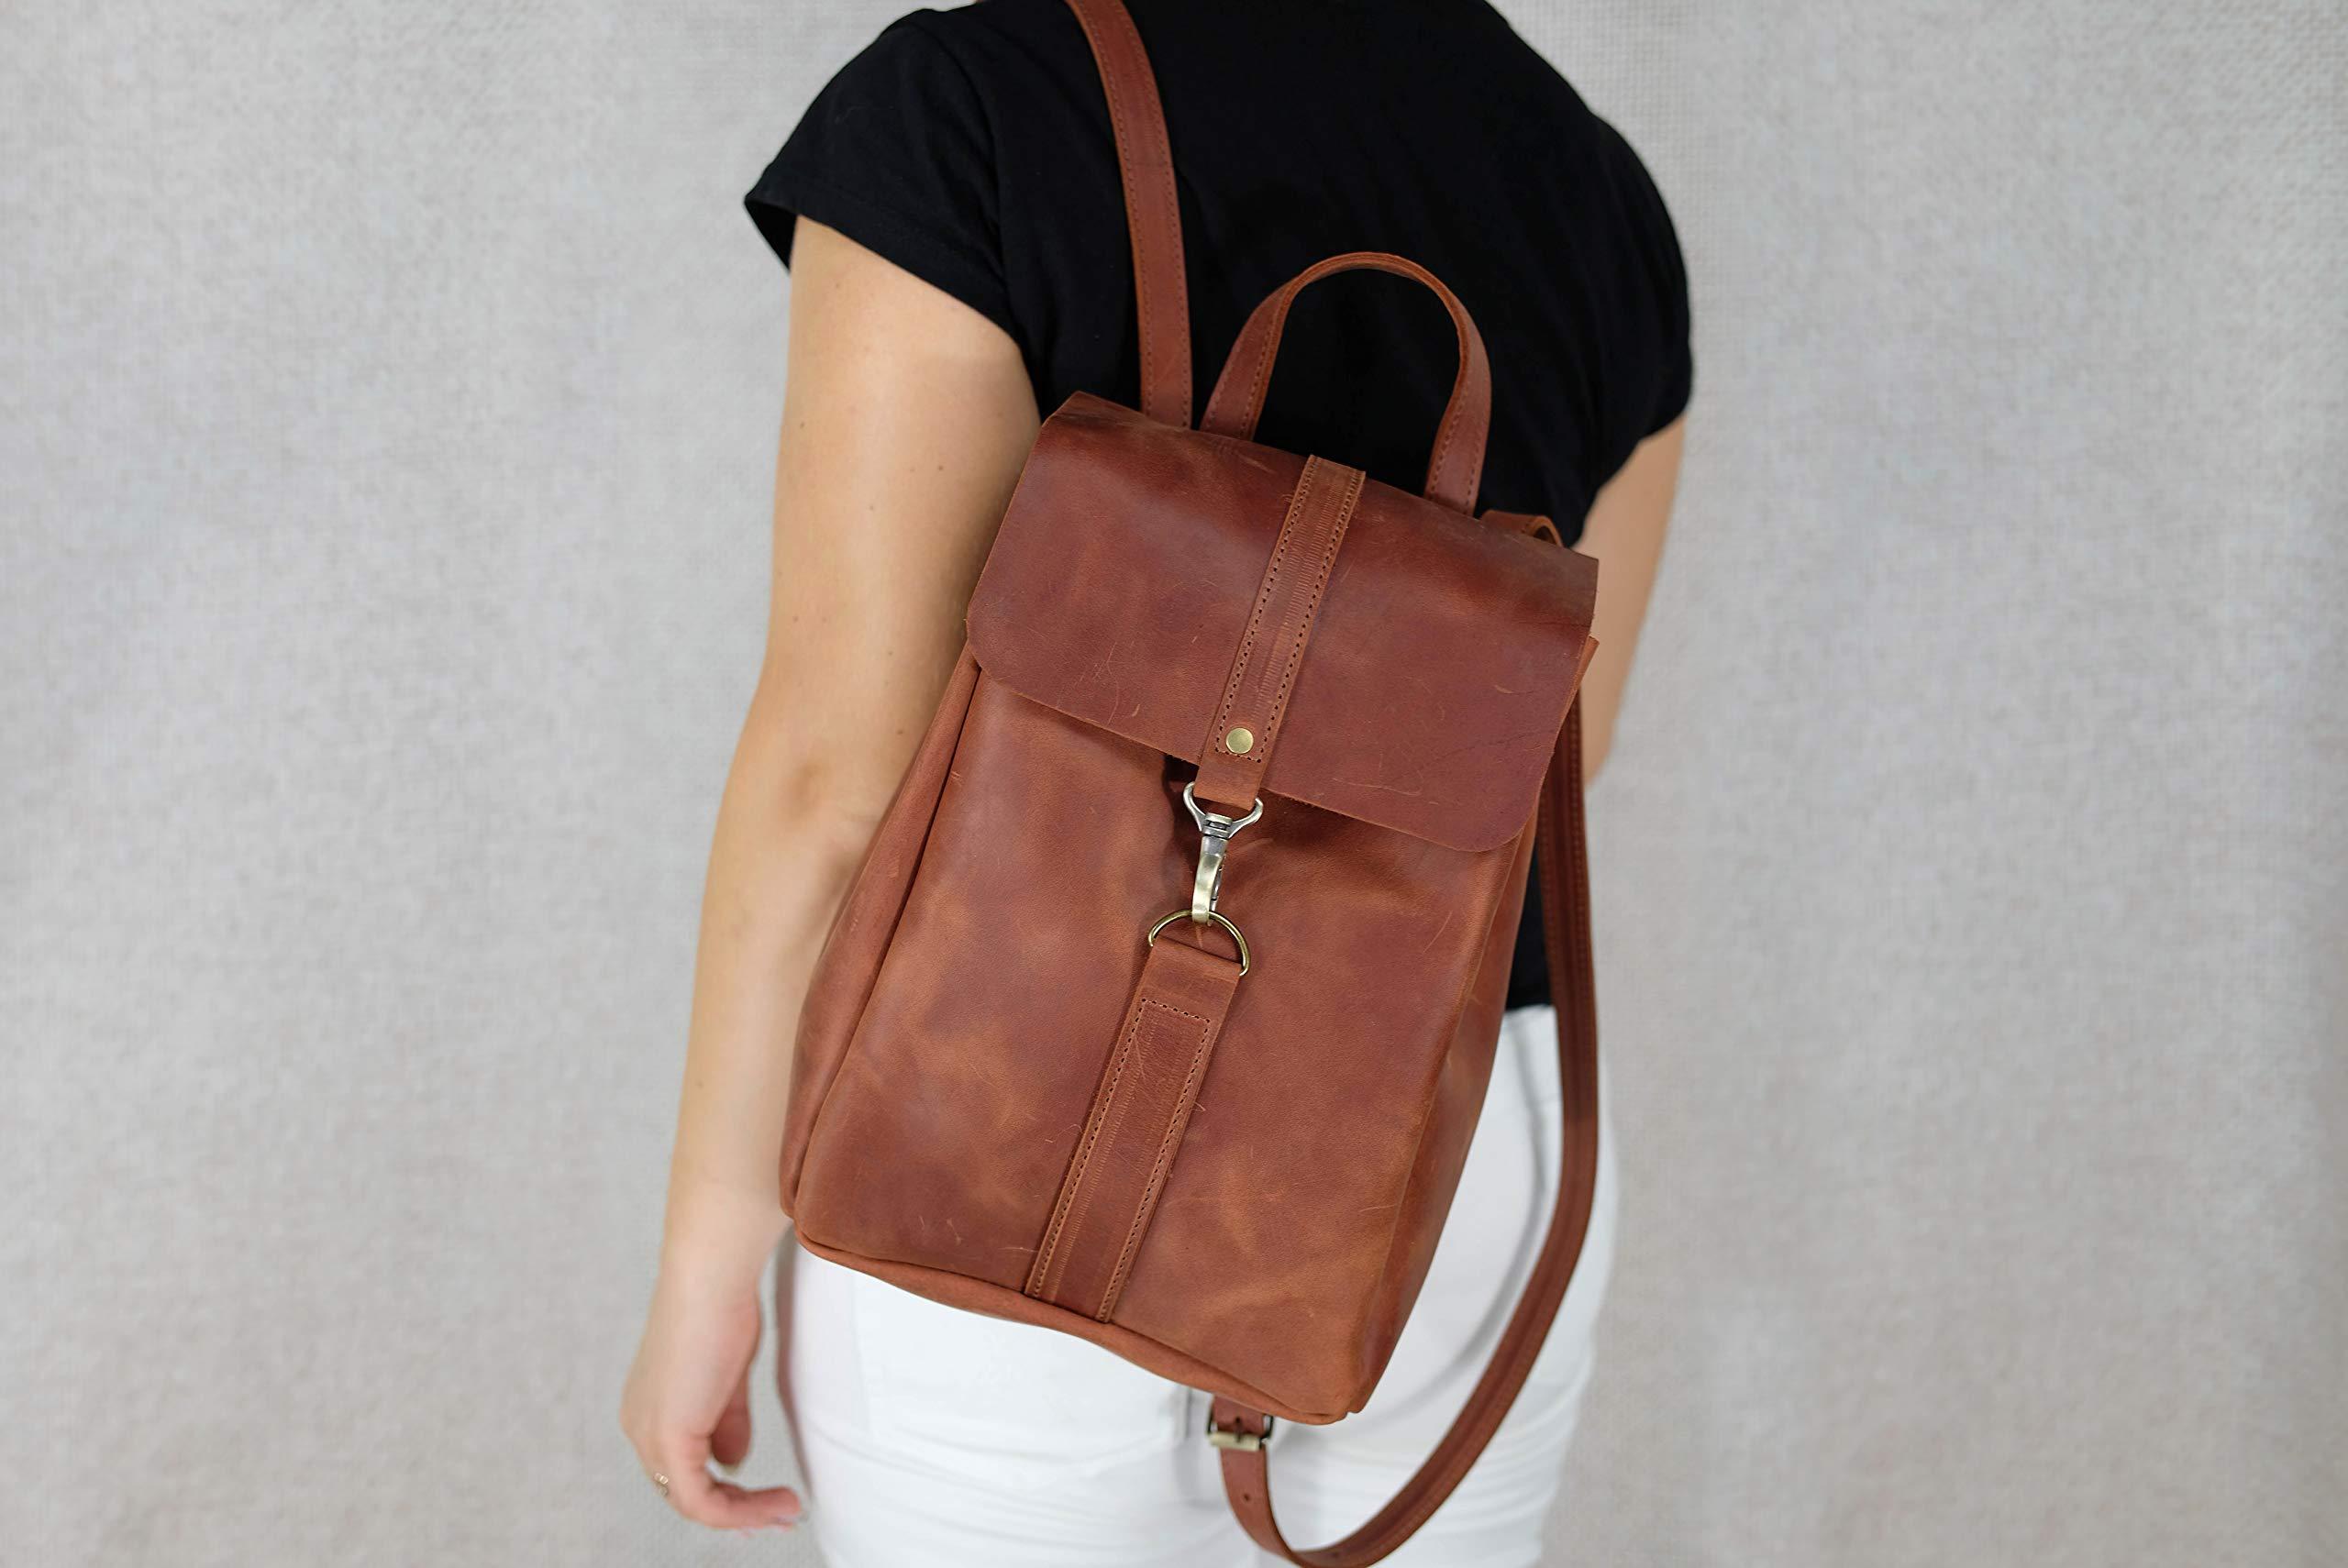 Women leather backpack, Brown backpack, Women shoulder bag, Drawstring backpack, Minimalist leather vintage rucksack Personalized Monogram 9 x 12.6 inch